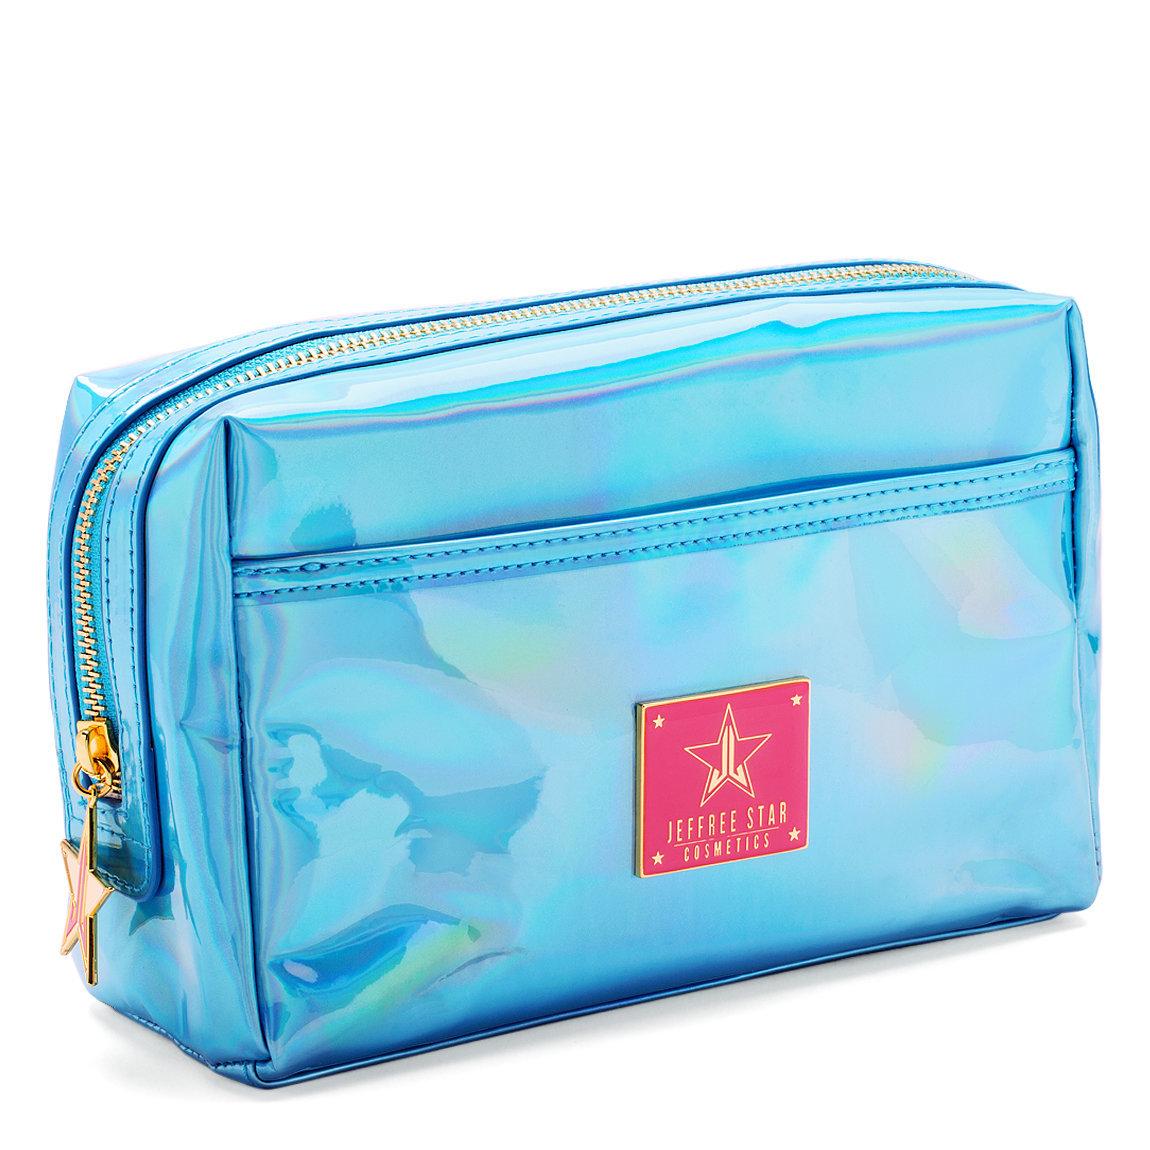 53d82c7b07dd07 Jeffree Star Cosmetics Makeup Bag Holographic Blue product smear.